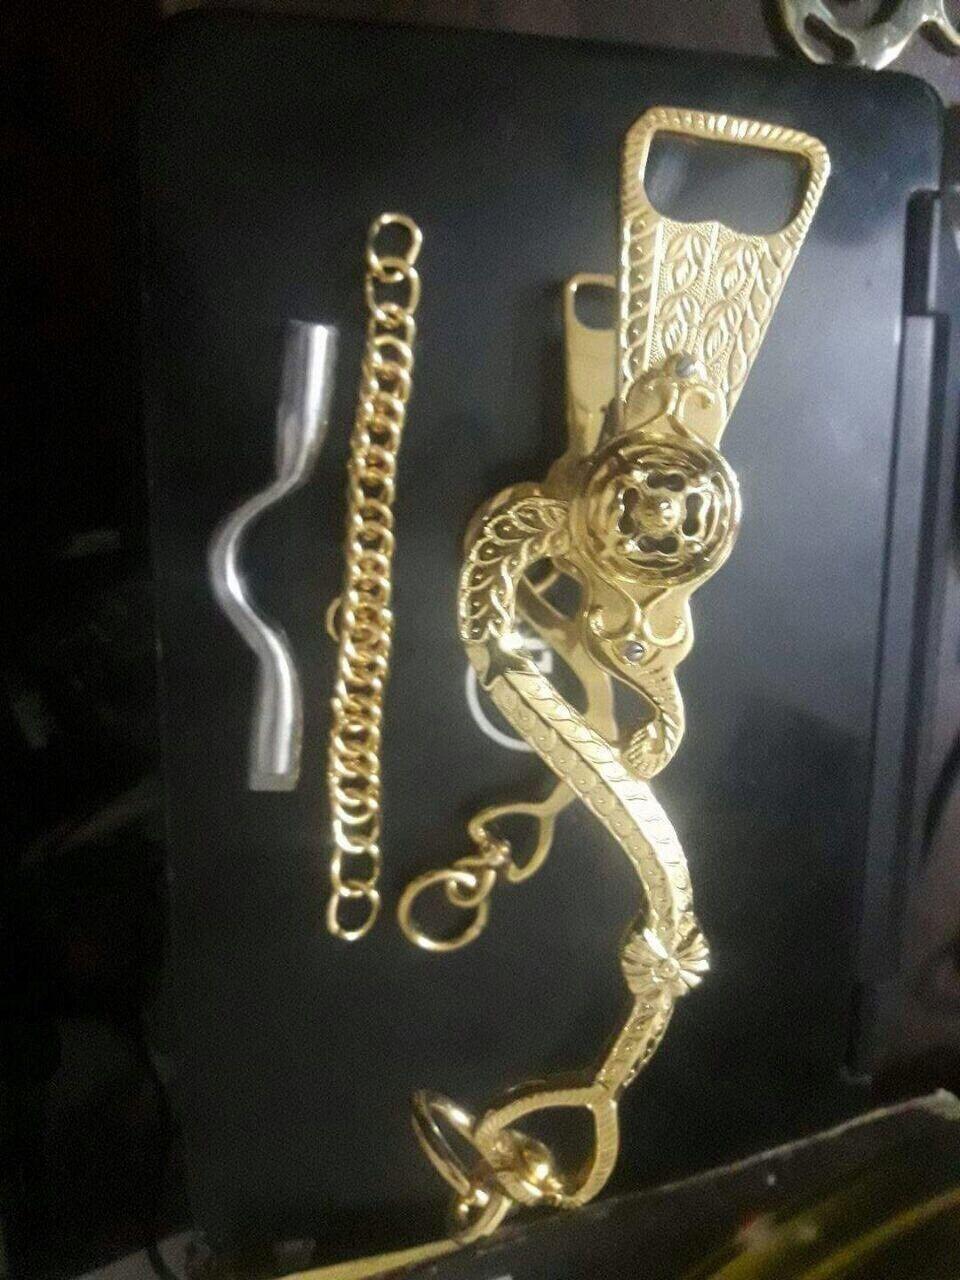 Caballo de cadena dorada vástagos Hackamore Bit Faizy